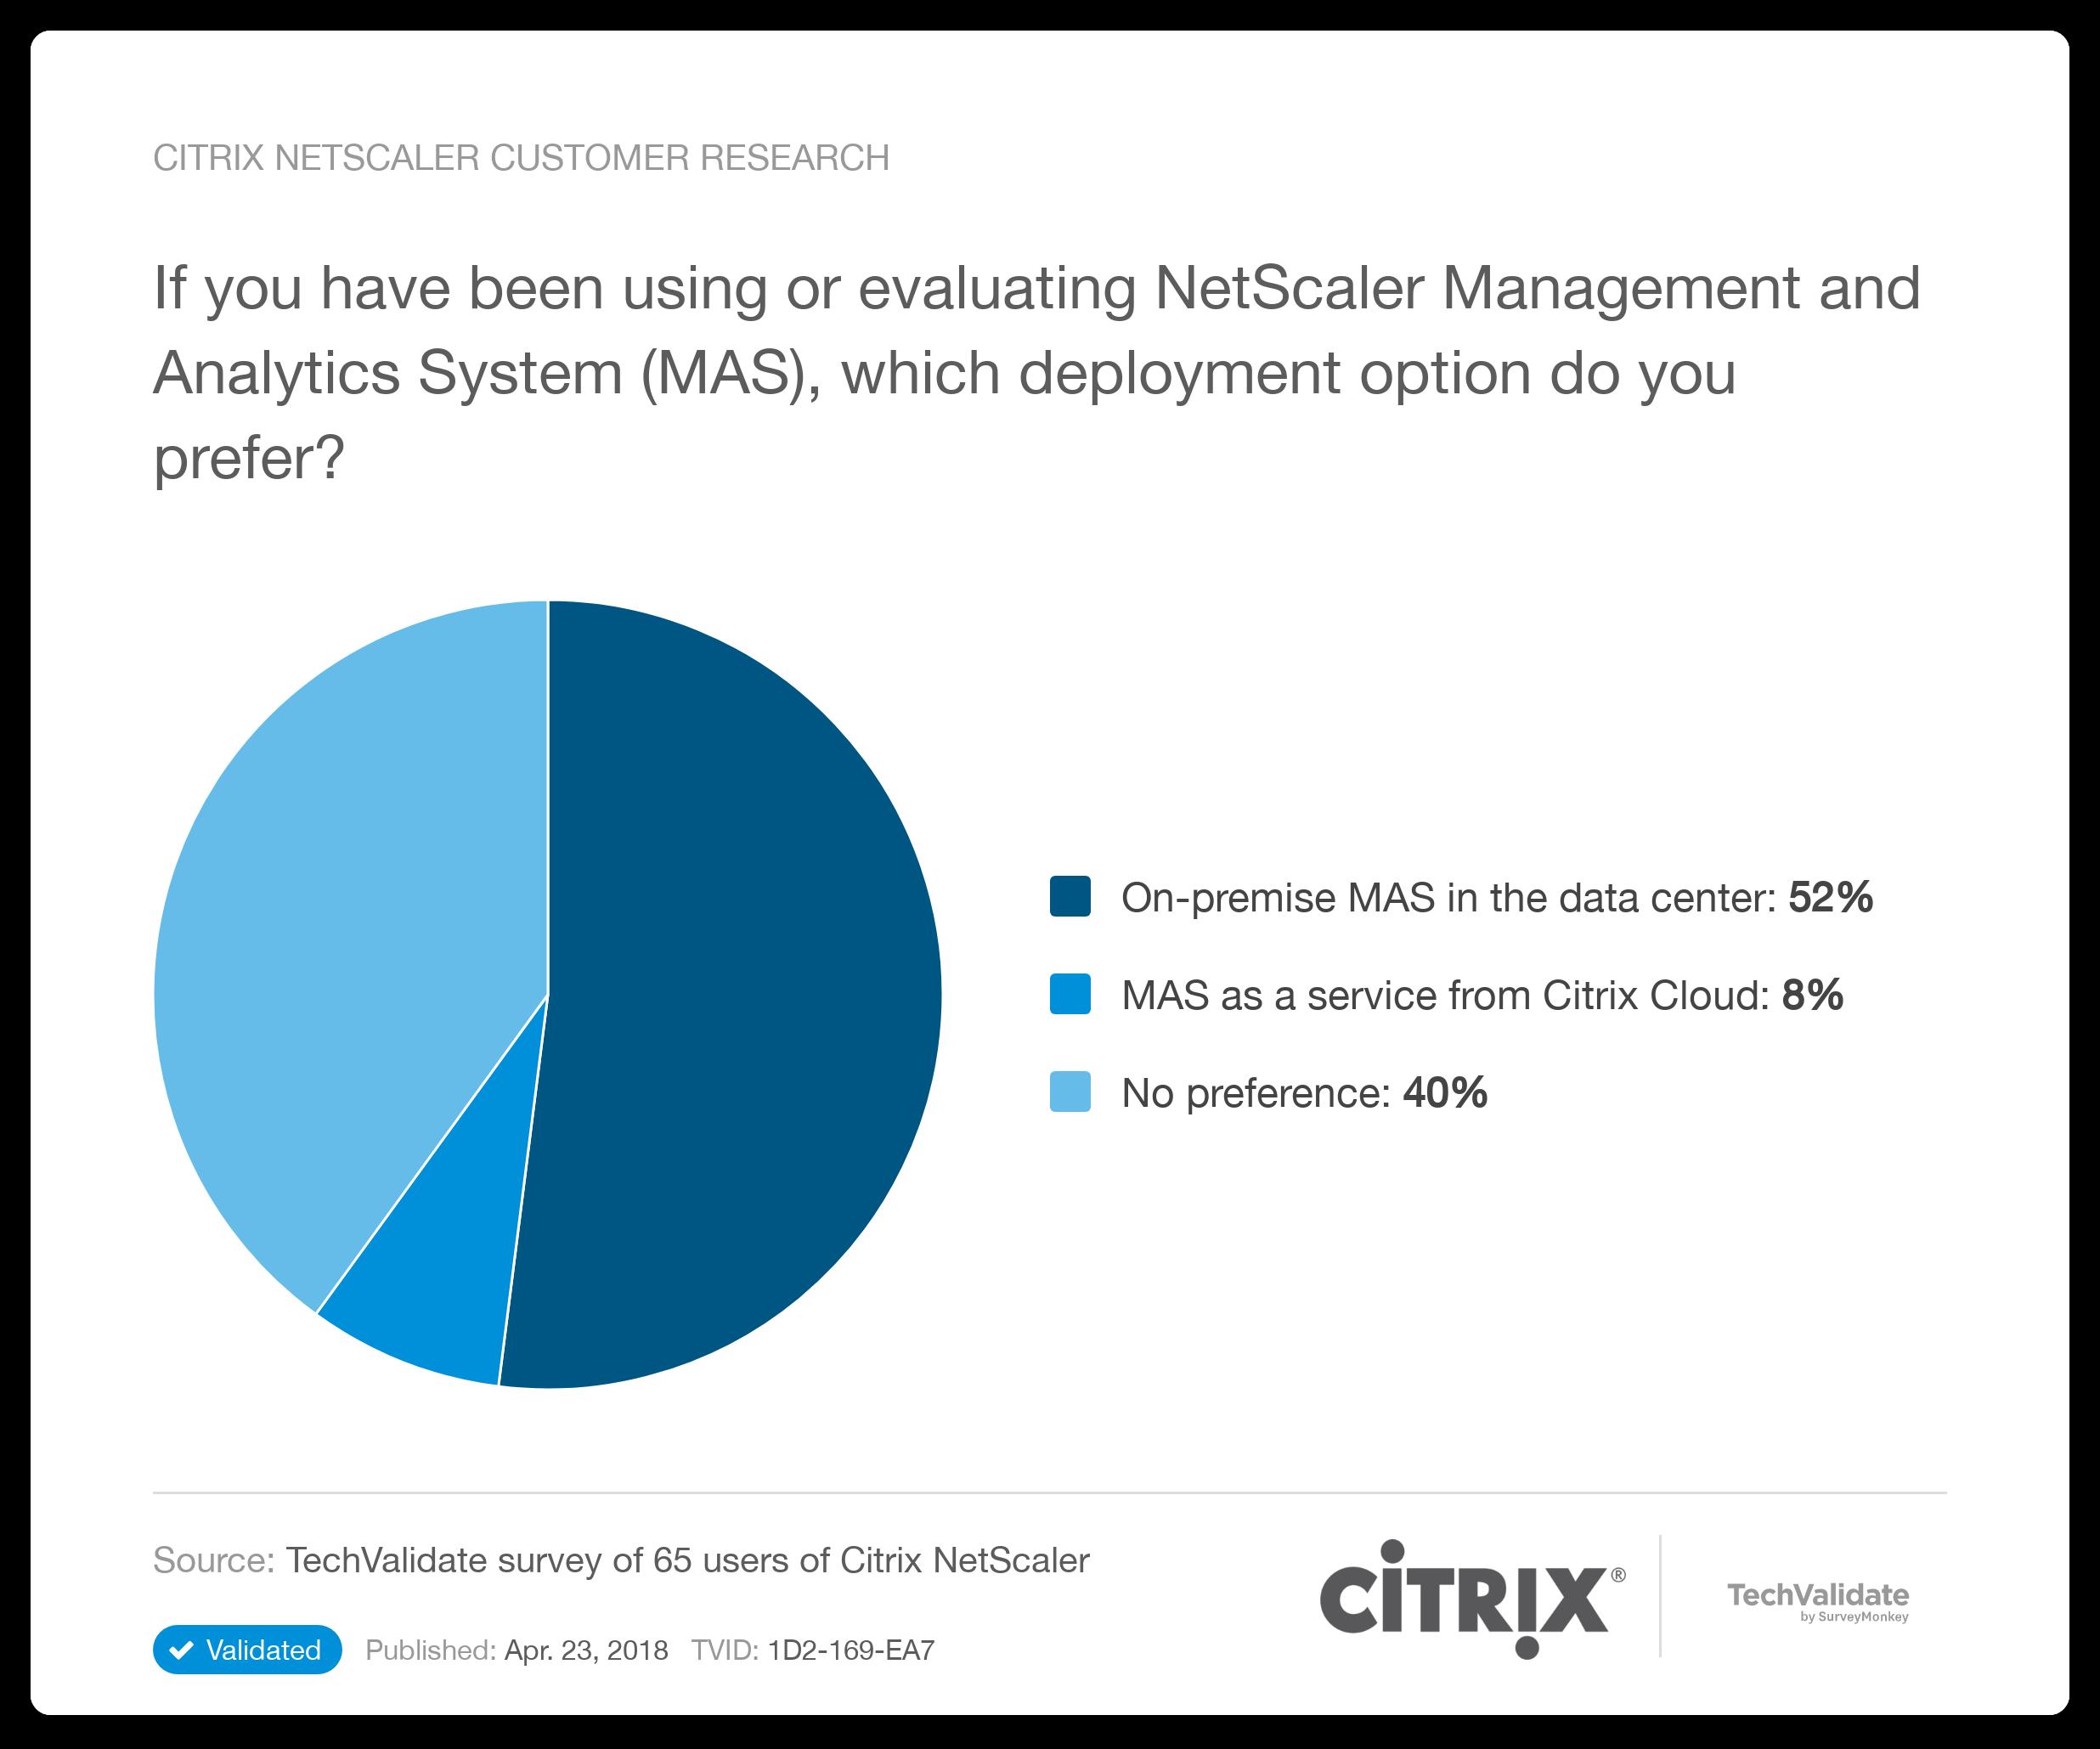 Citrix NetScaler Research Chart: Citrix NetScaler Customer Research